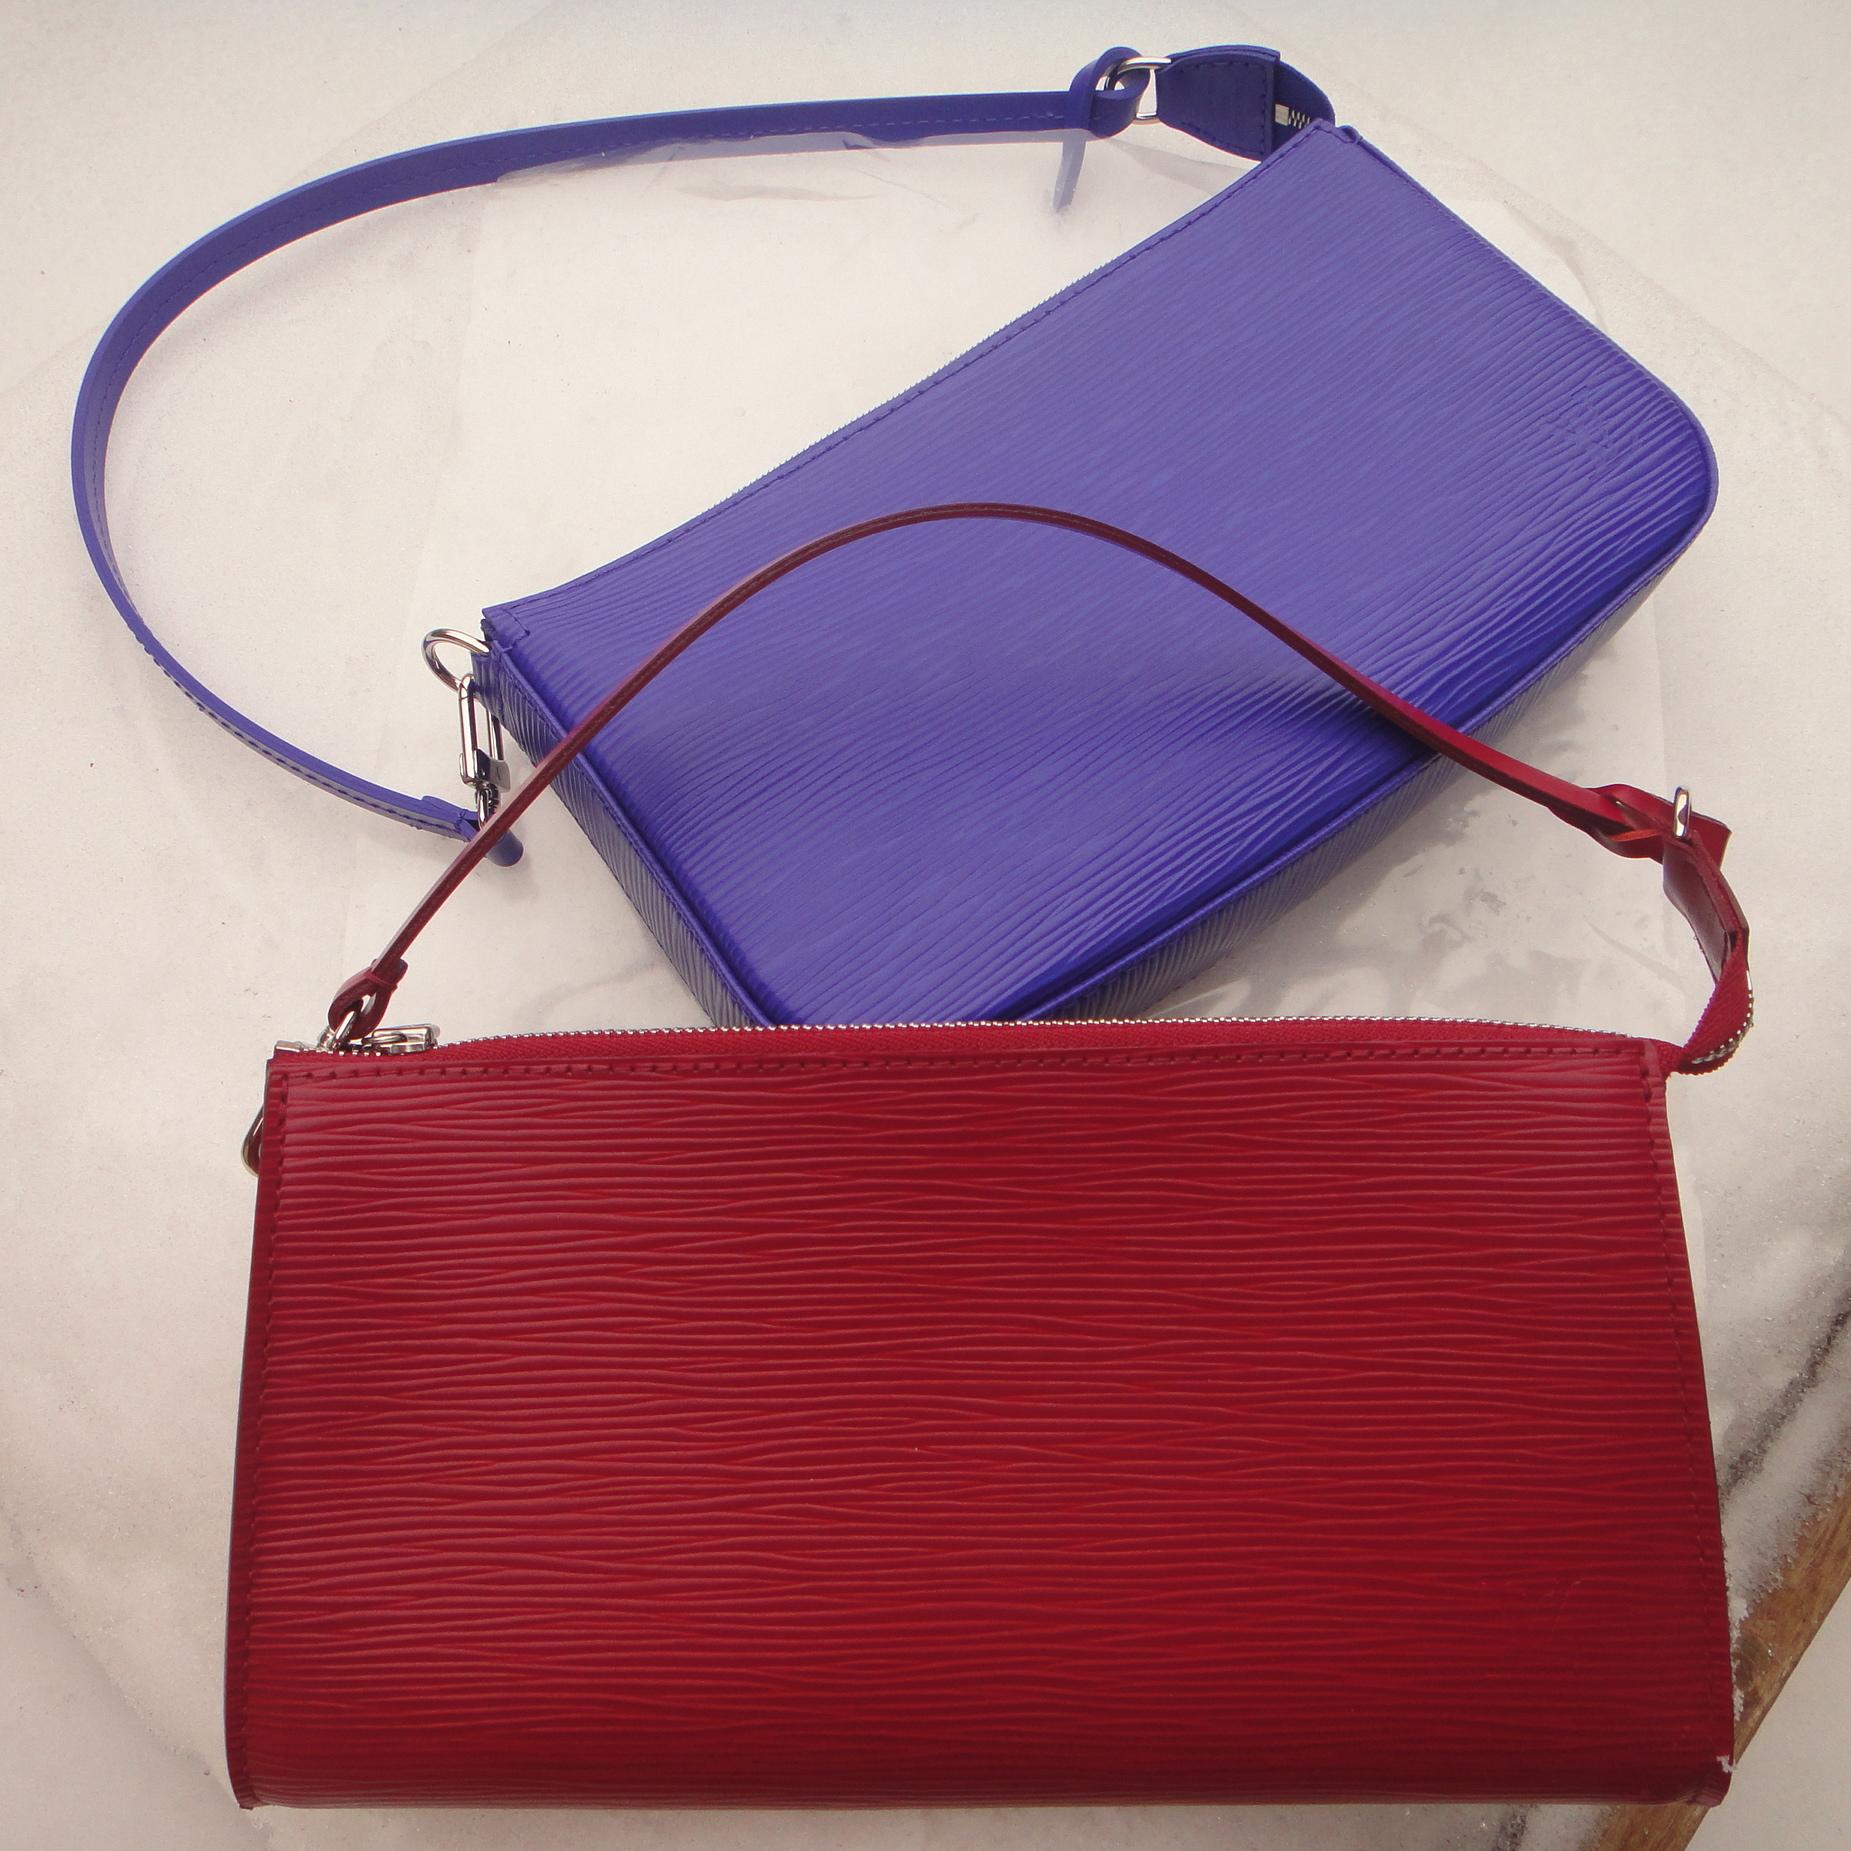 LV Pochette Accessoires top   NEW MODEL in FIGUE, bottom OLD MODEL in FUCHSIA